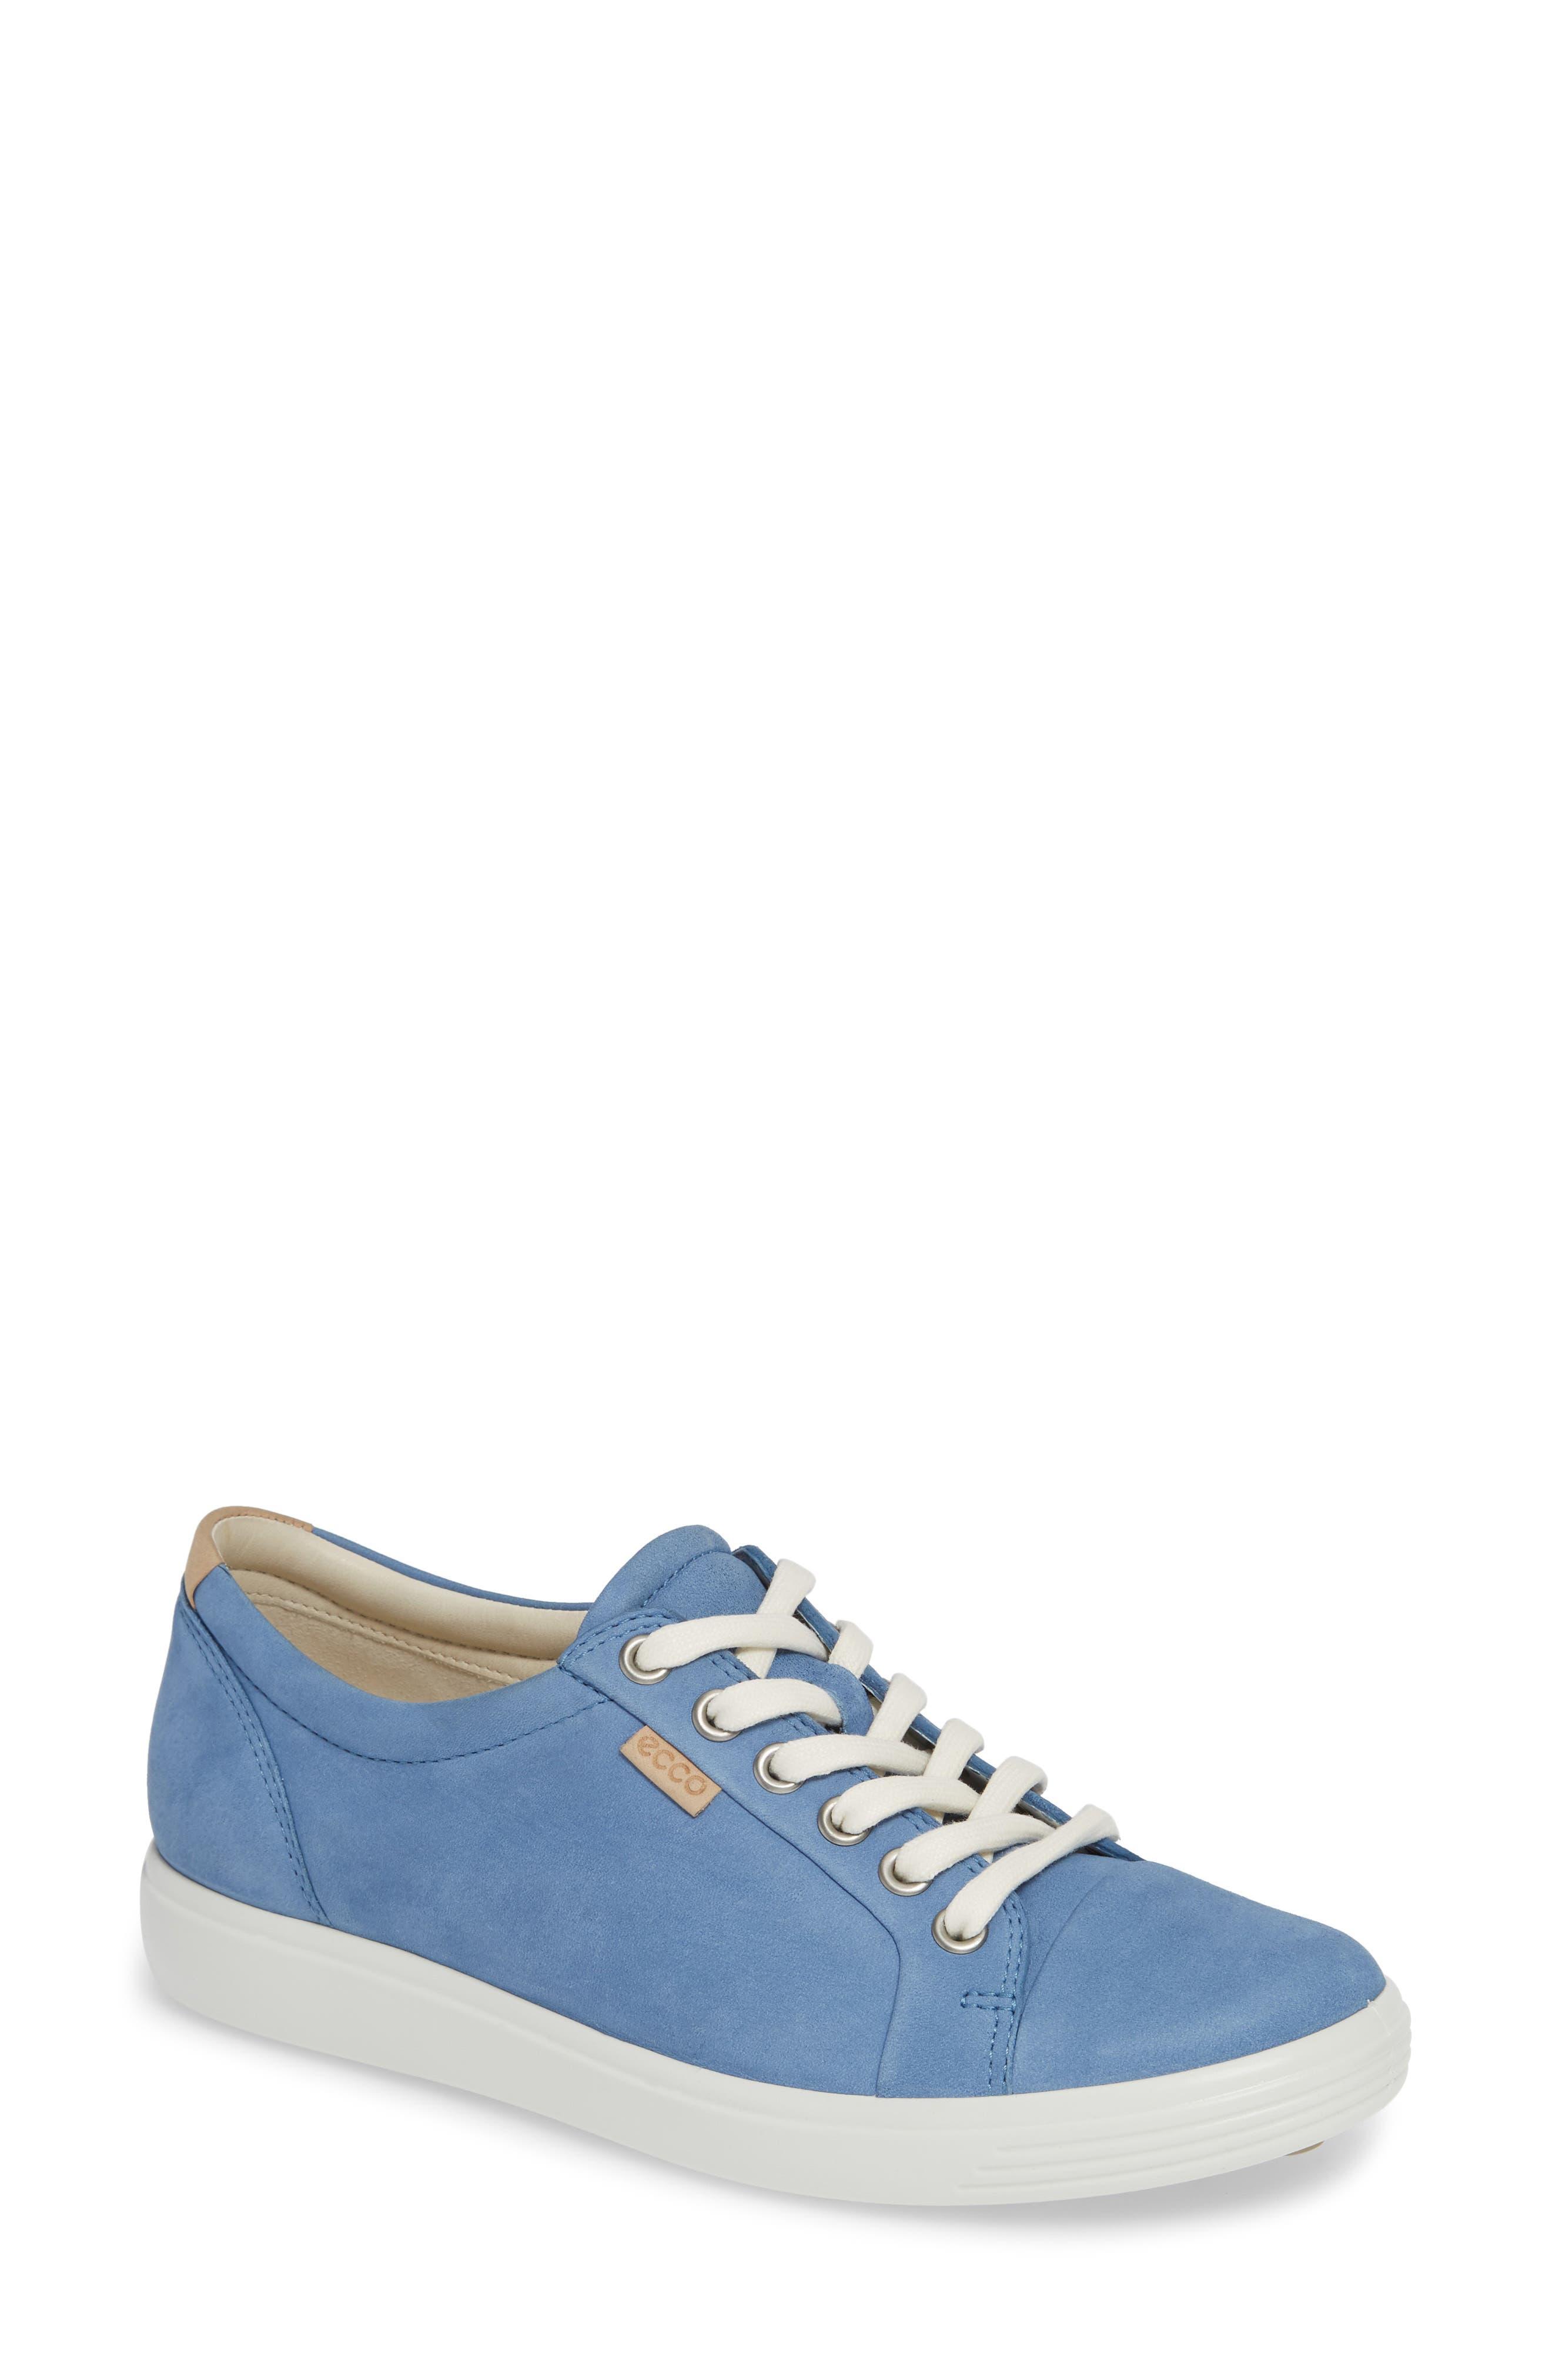 Soft 7 Sneaker,                         Main,                         color, RETRO BLUE LEATHER